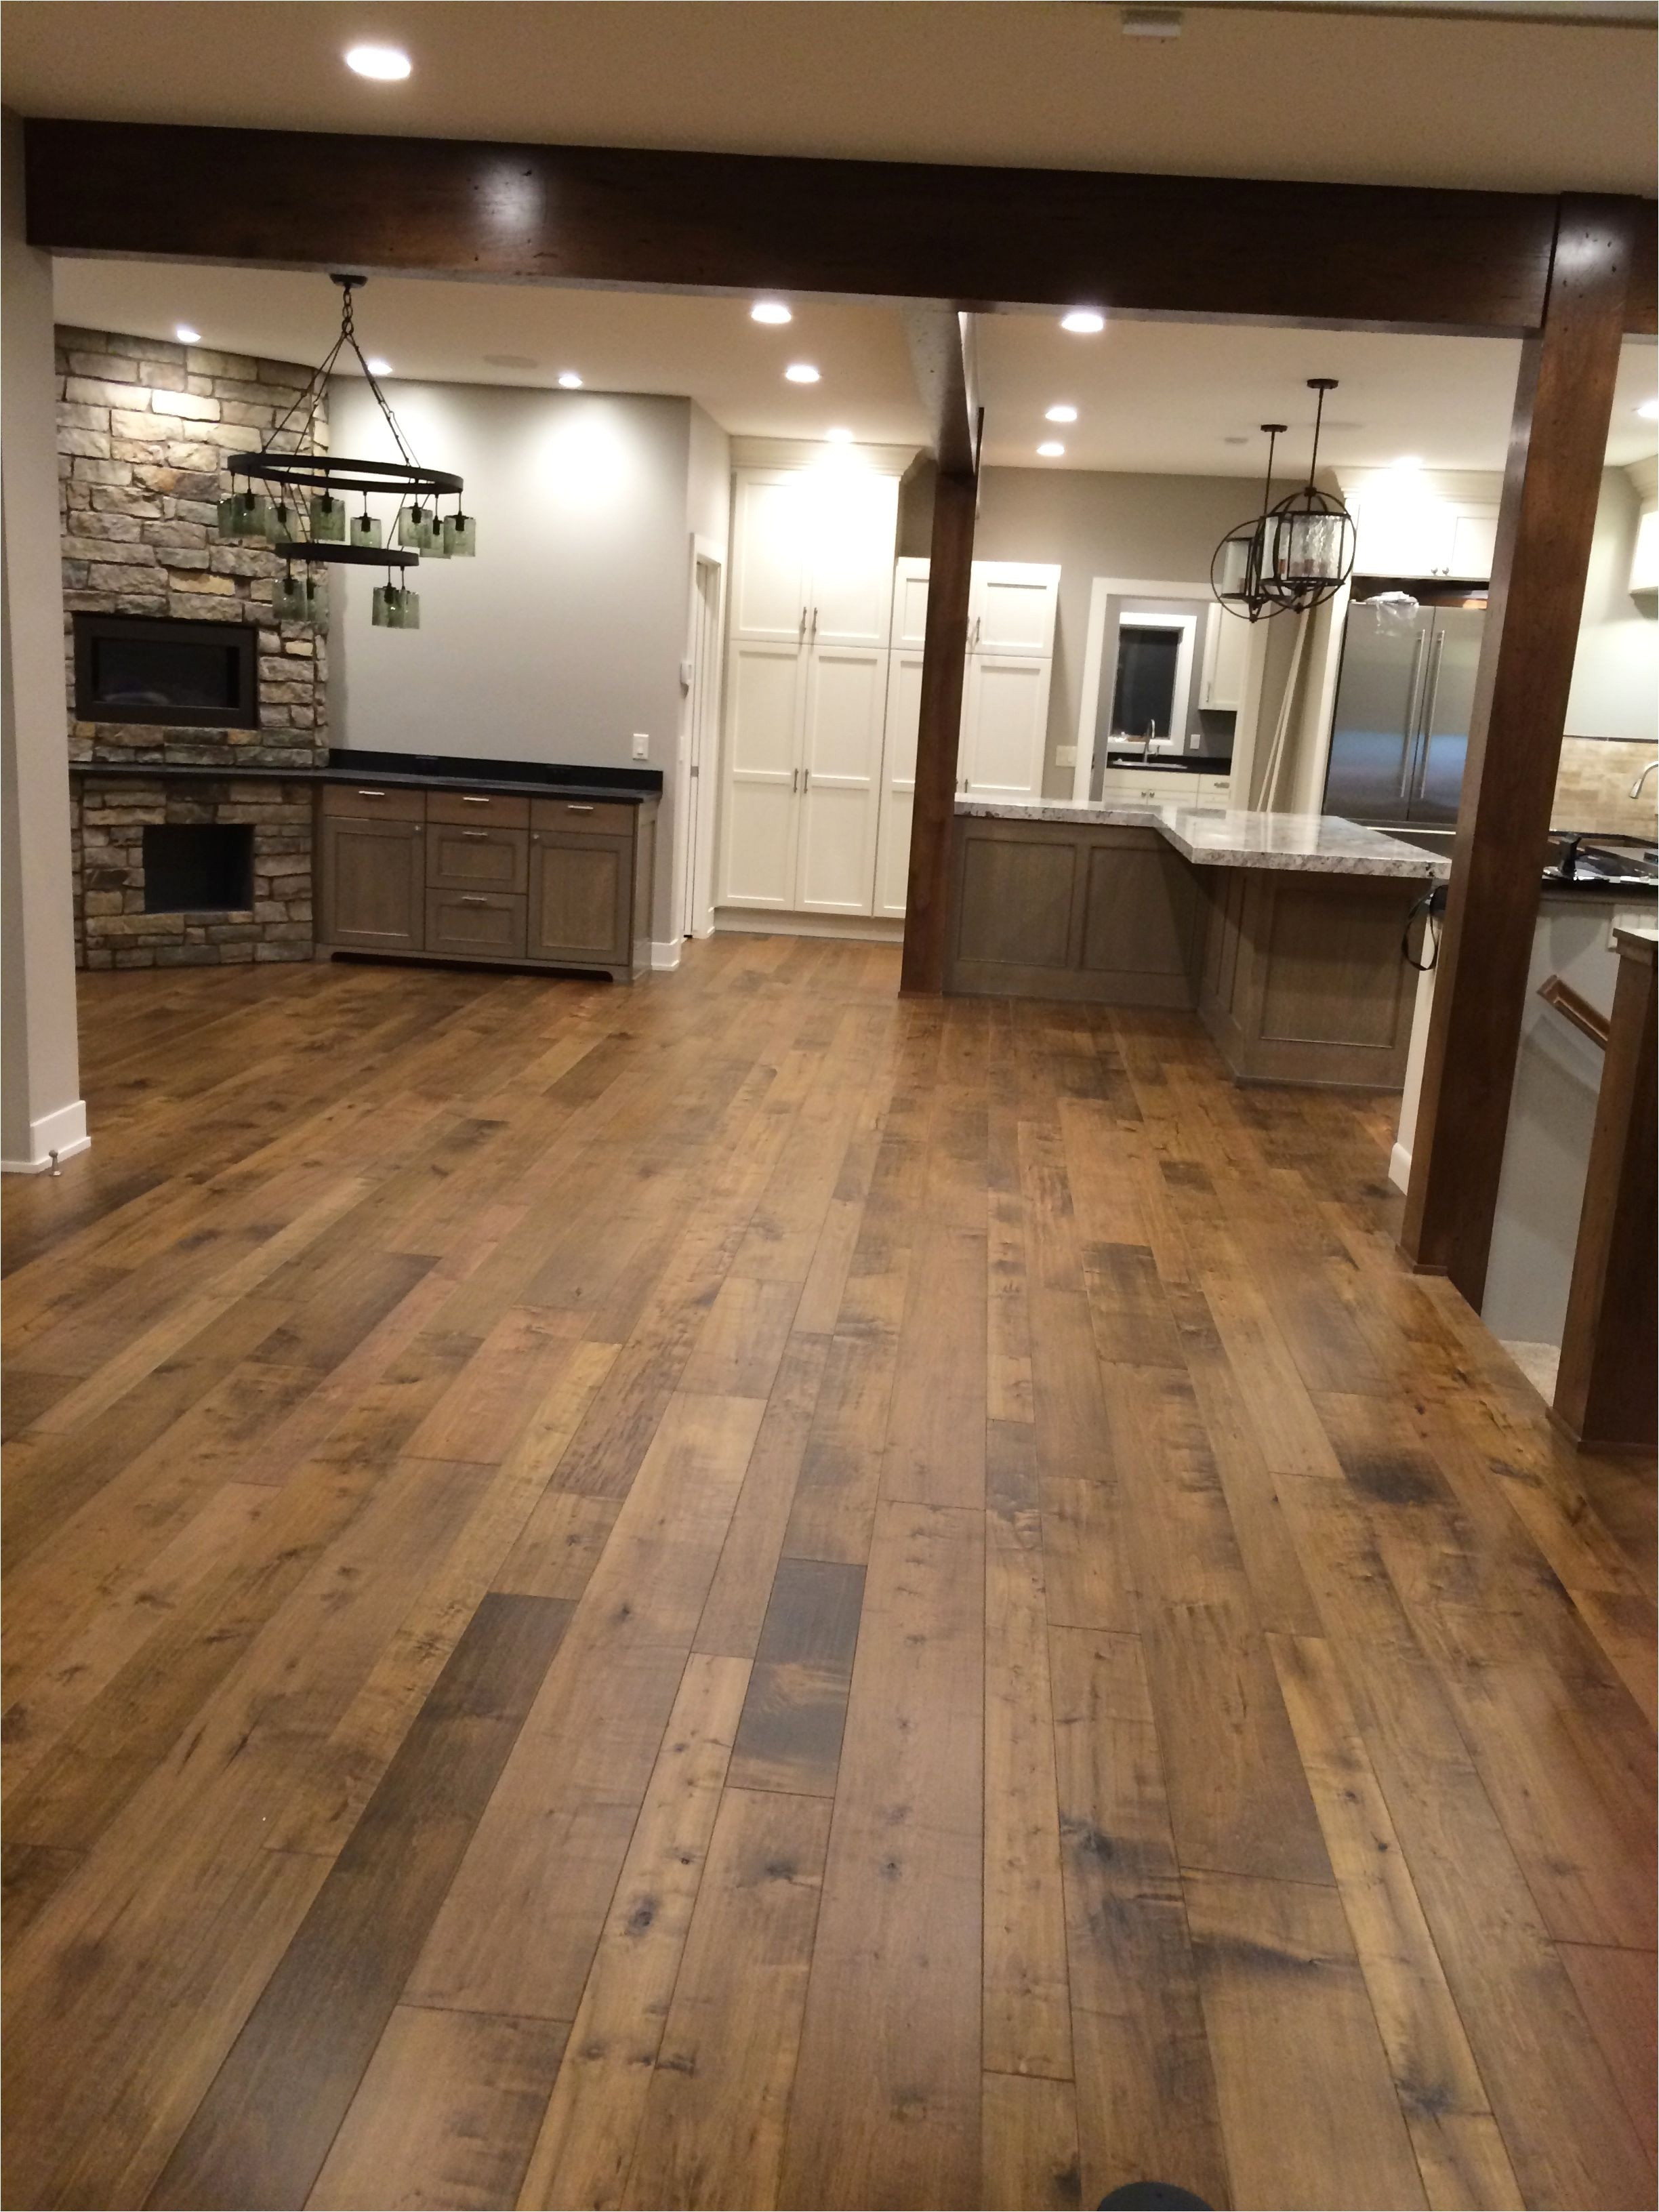 vinyl hardwood flooring vs laminate of flooring design ideas find ideas and inspiration for flooring for 37 elegant stain laminate flooring stock